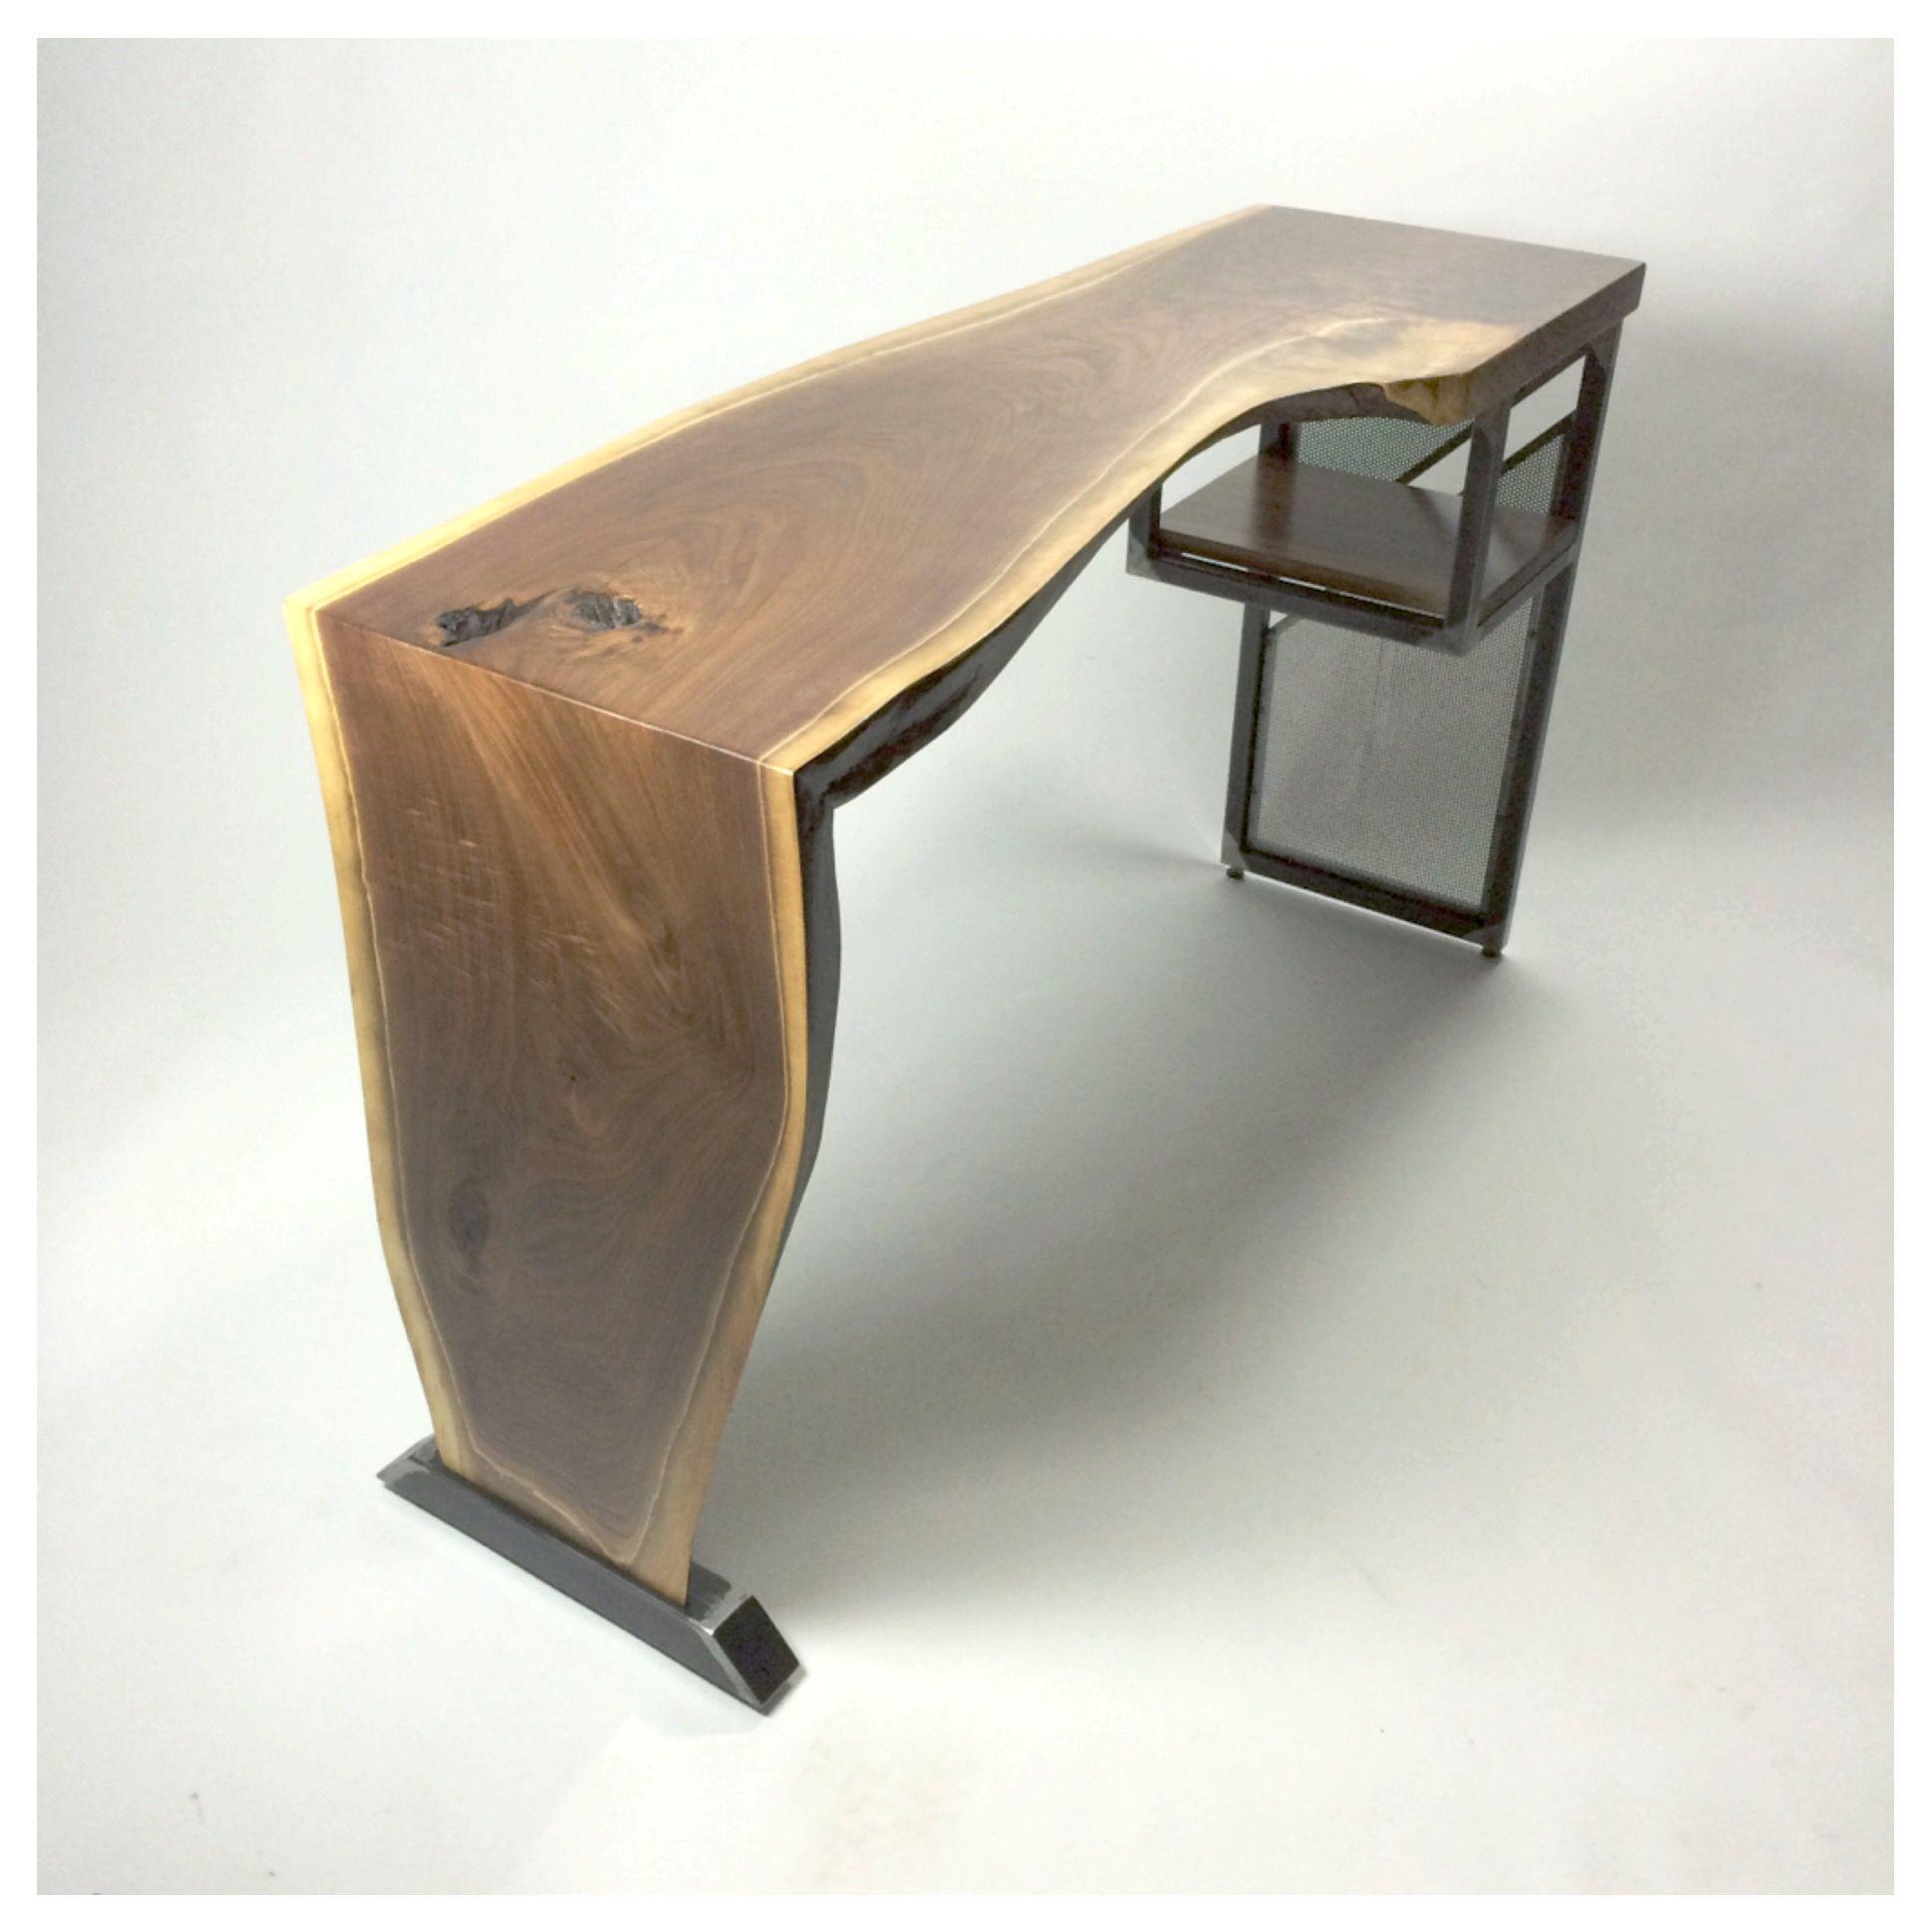 Handmade Live Edge Waterfall Desk Modern Industrial Steel